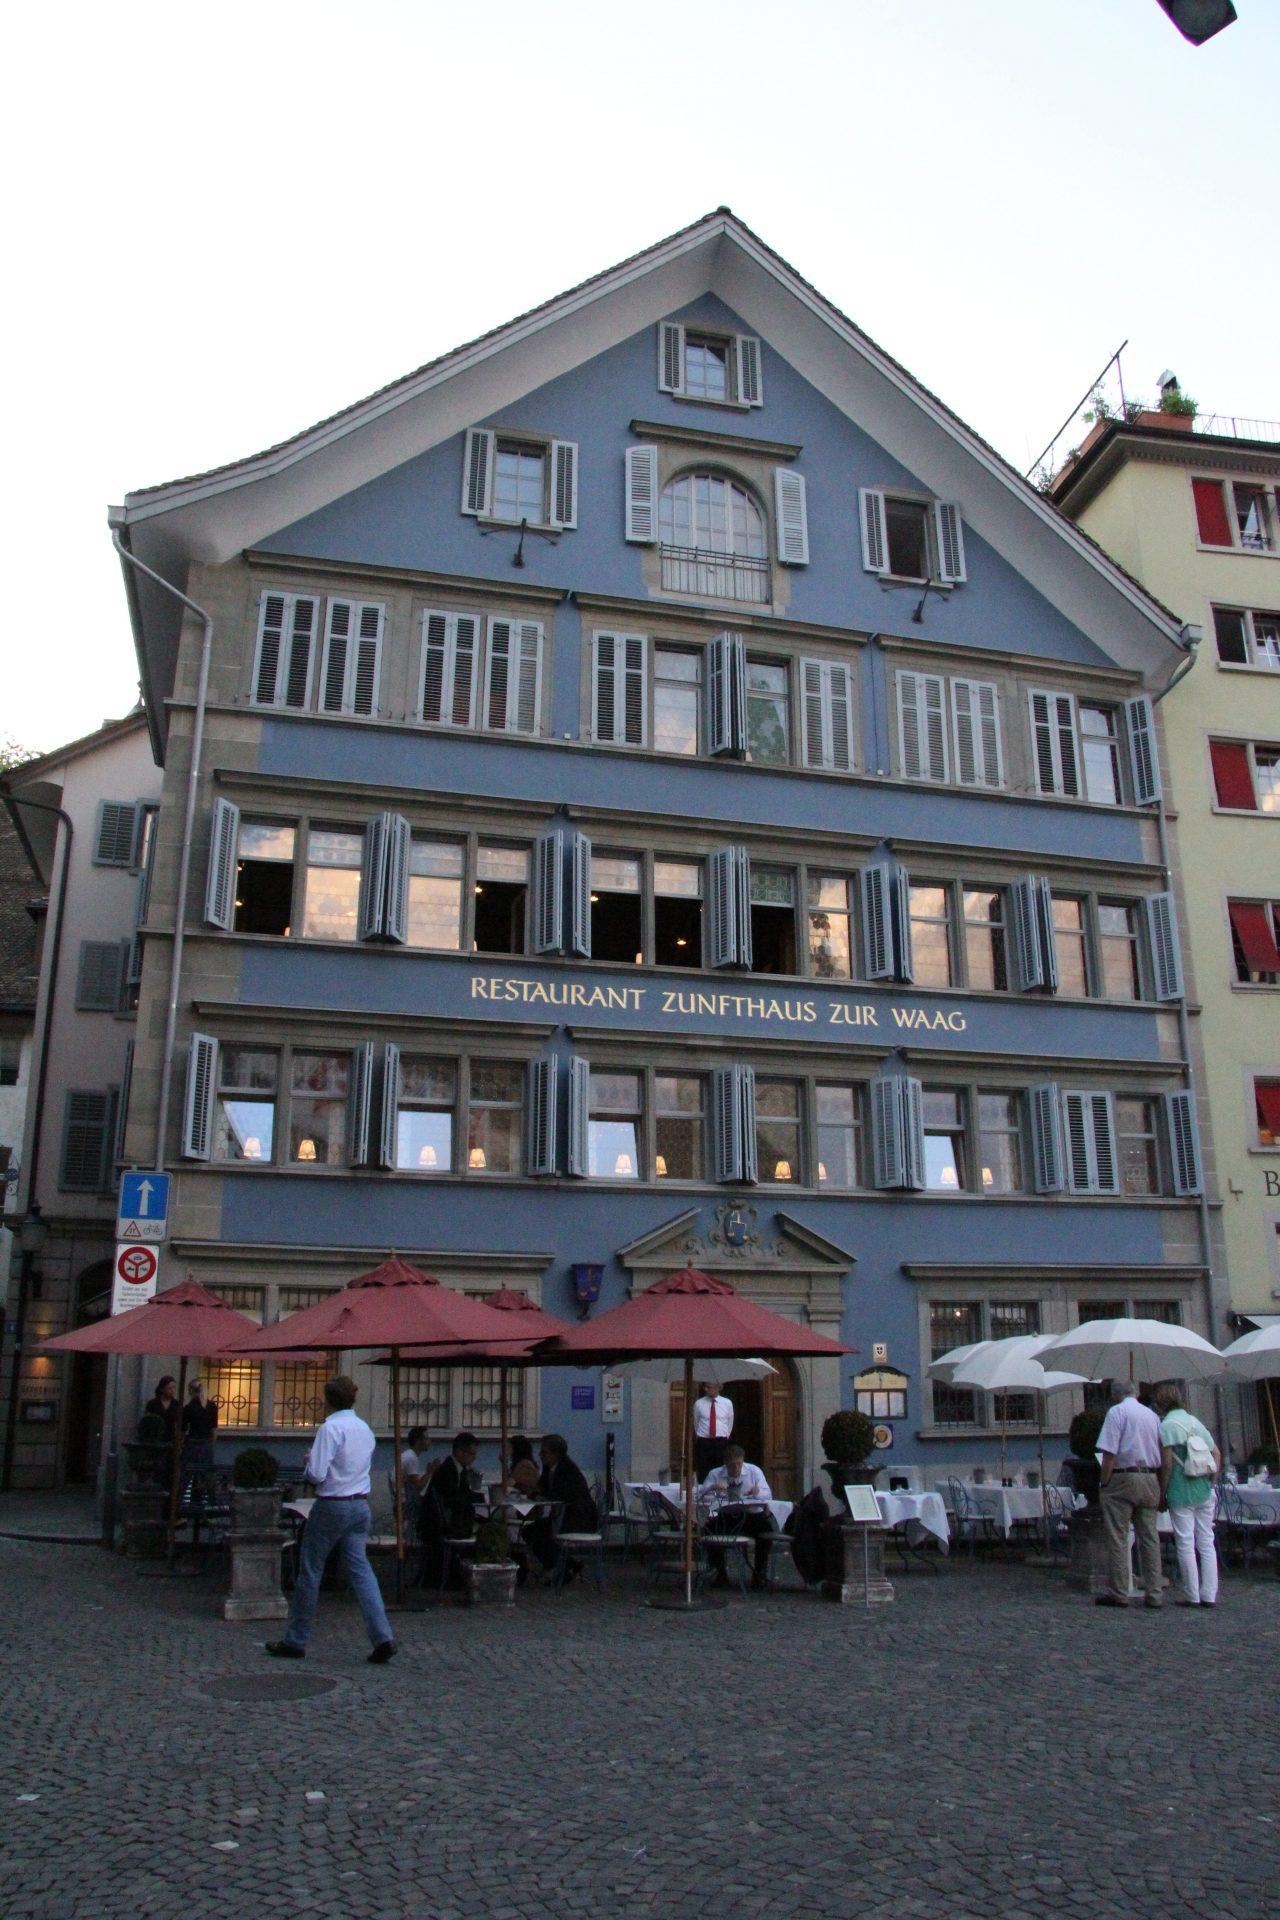 Дом Гильдий Zunfthaus zur Waag, Цюрих, Швейцария. Июль, 2012